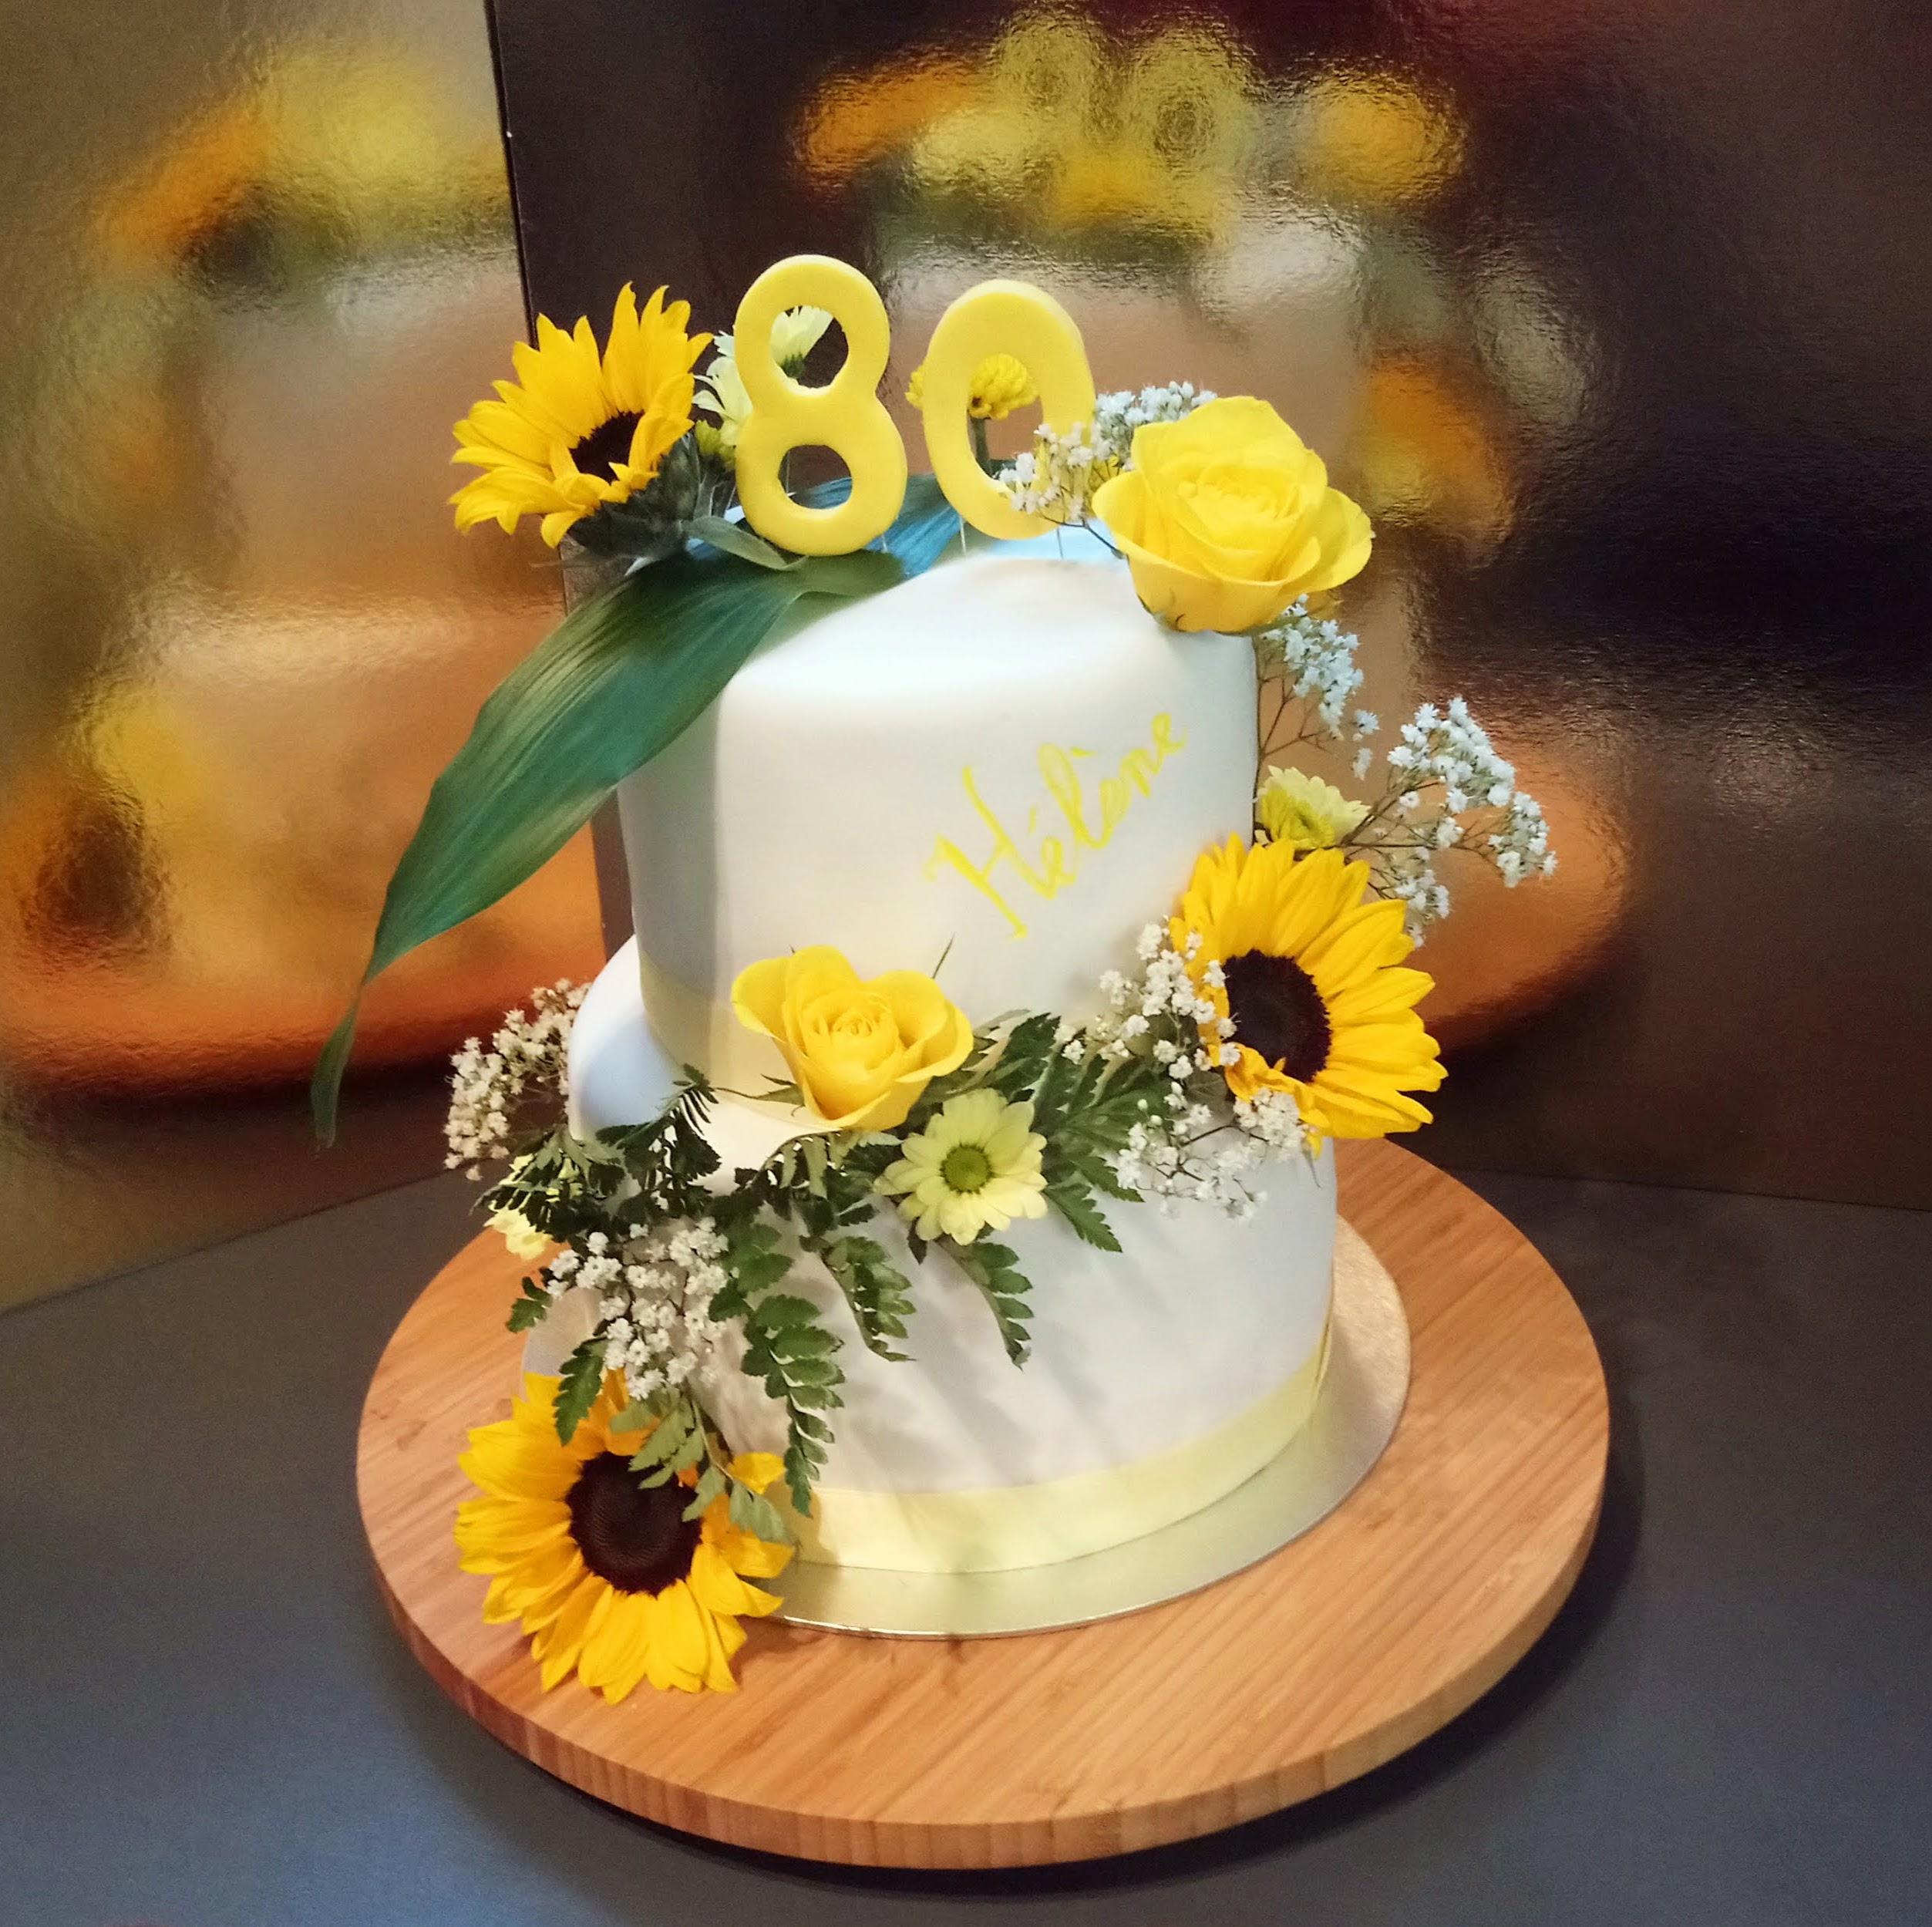 Gâteau tournesol